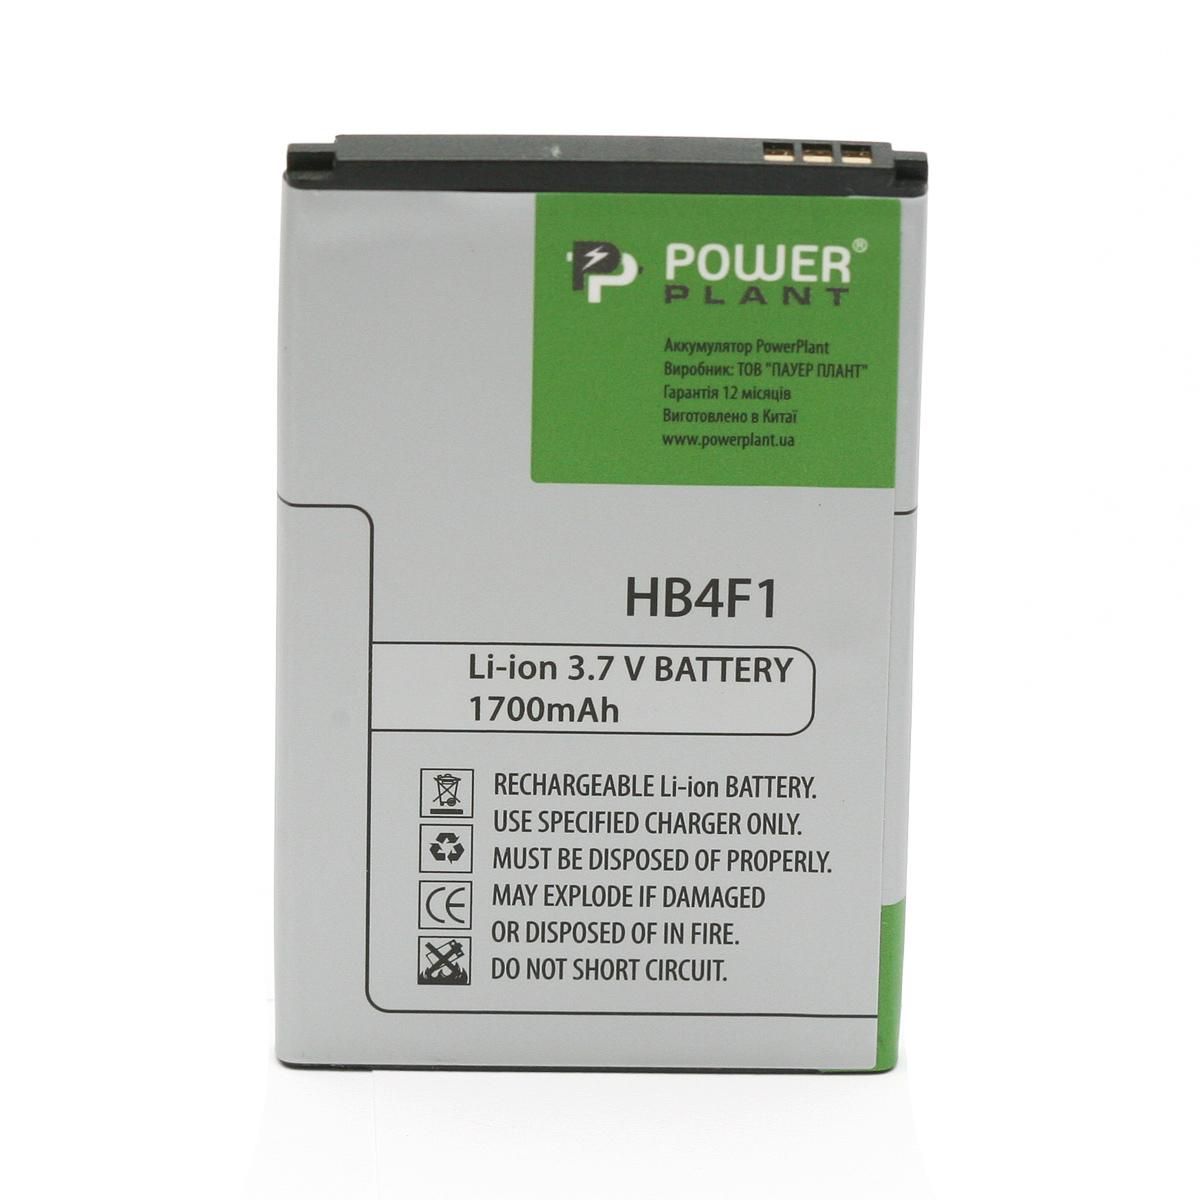 Купить Аккумулятор PowerPlant Huawei C8600 (HB4F1) 1700mAh